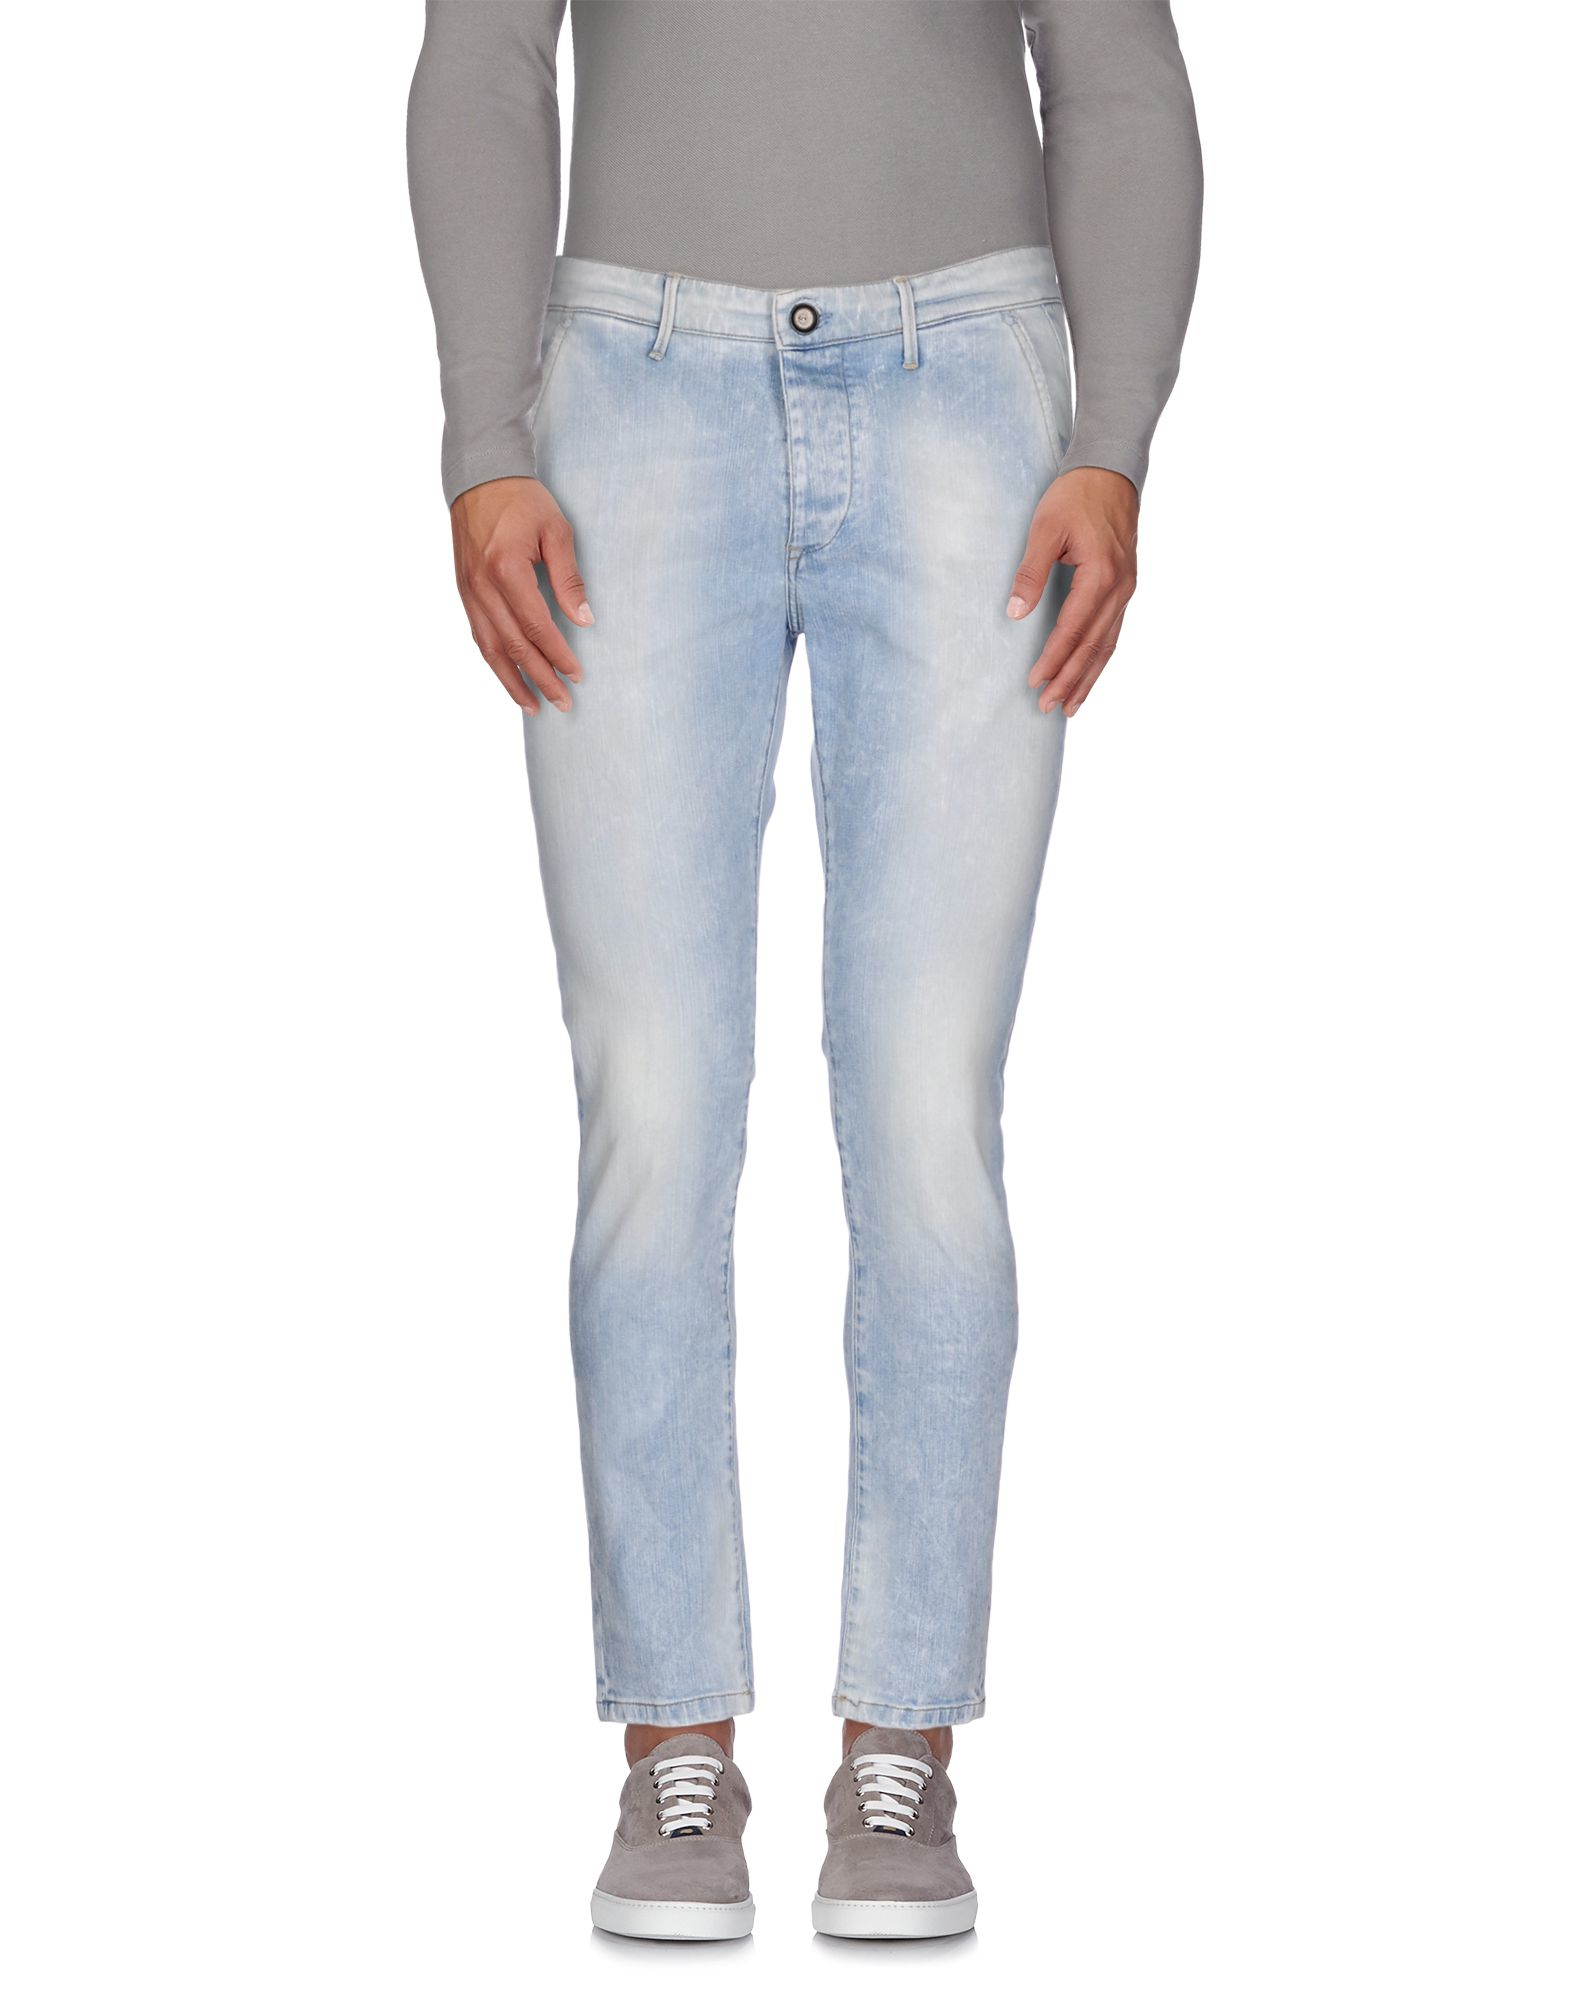 0/zero construction Denim Trousers in Blue for Men